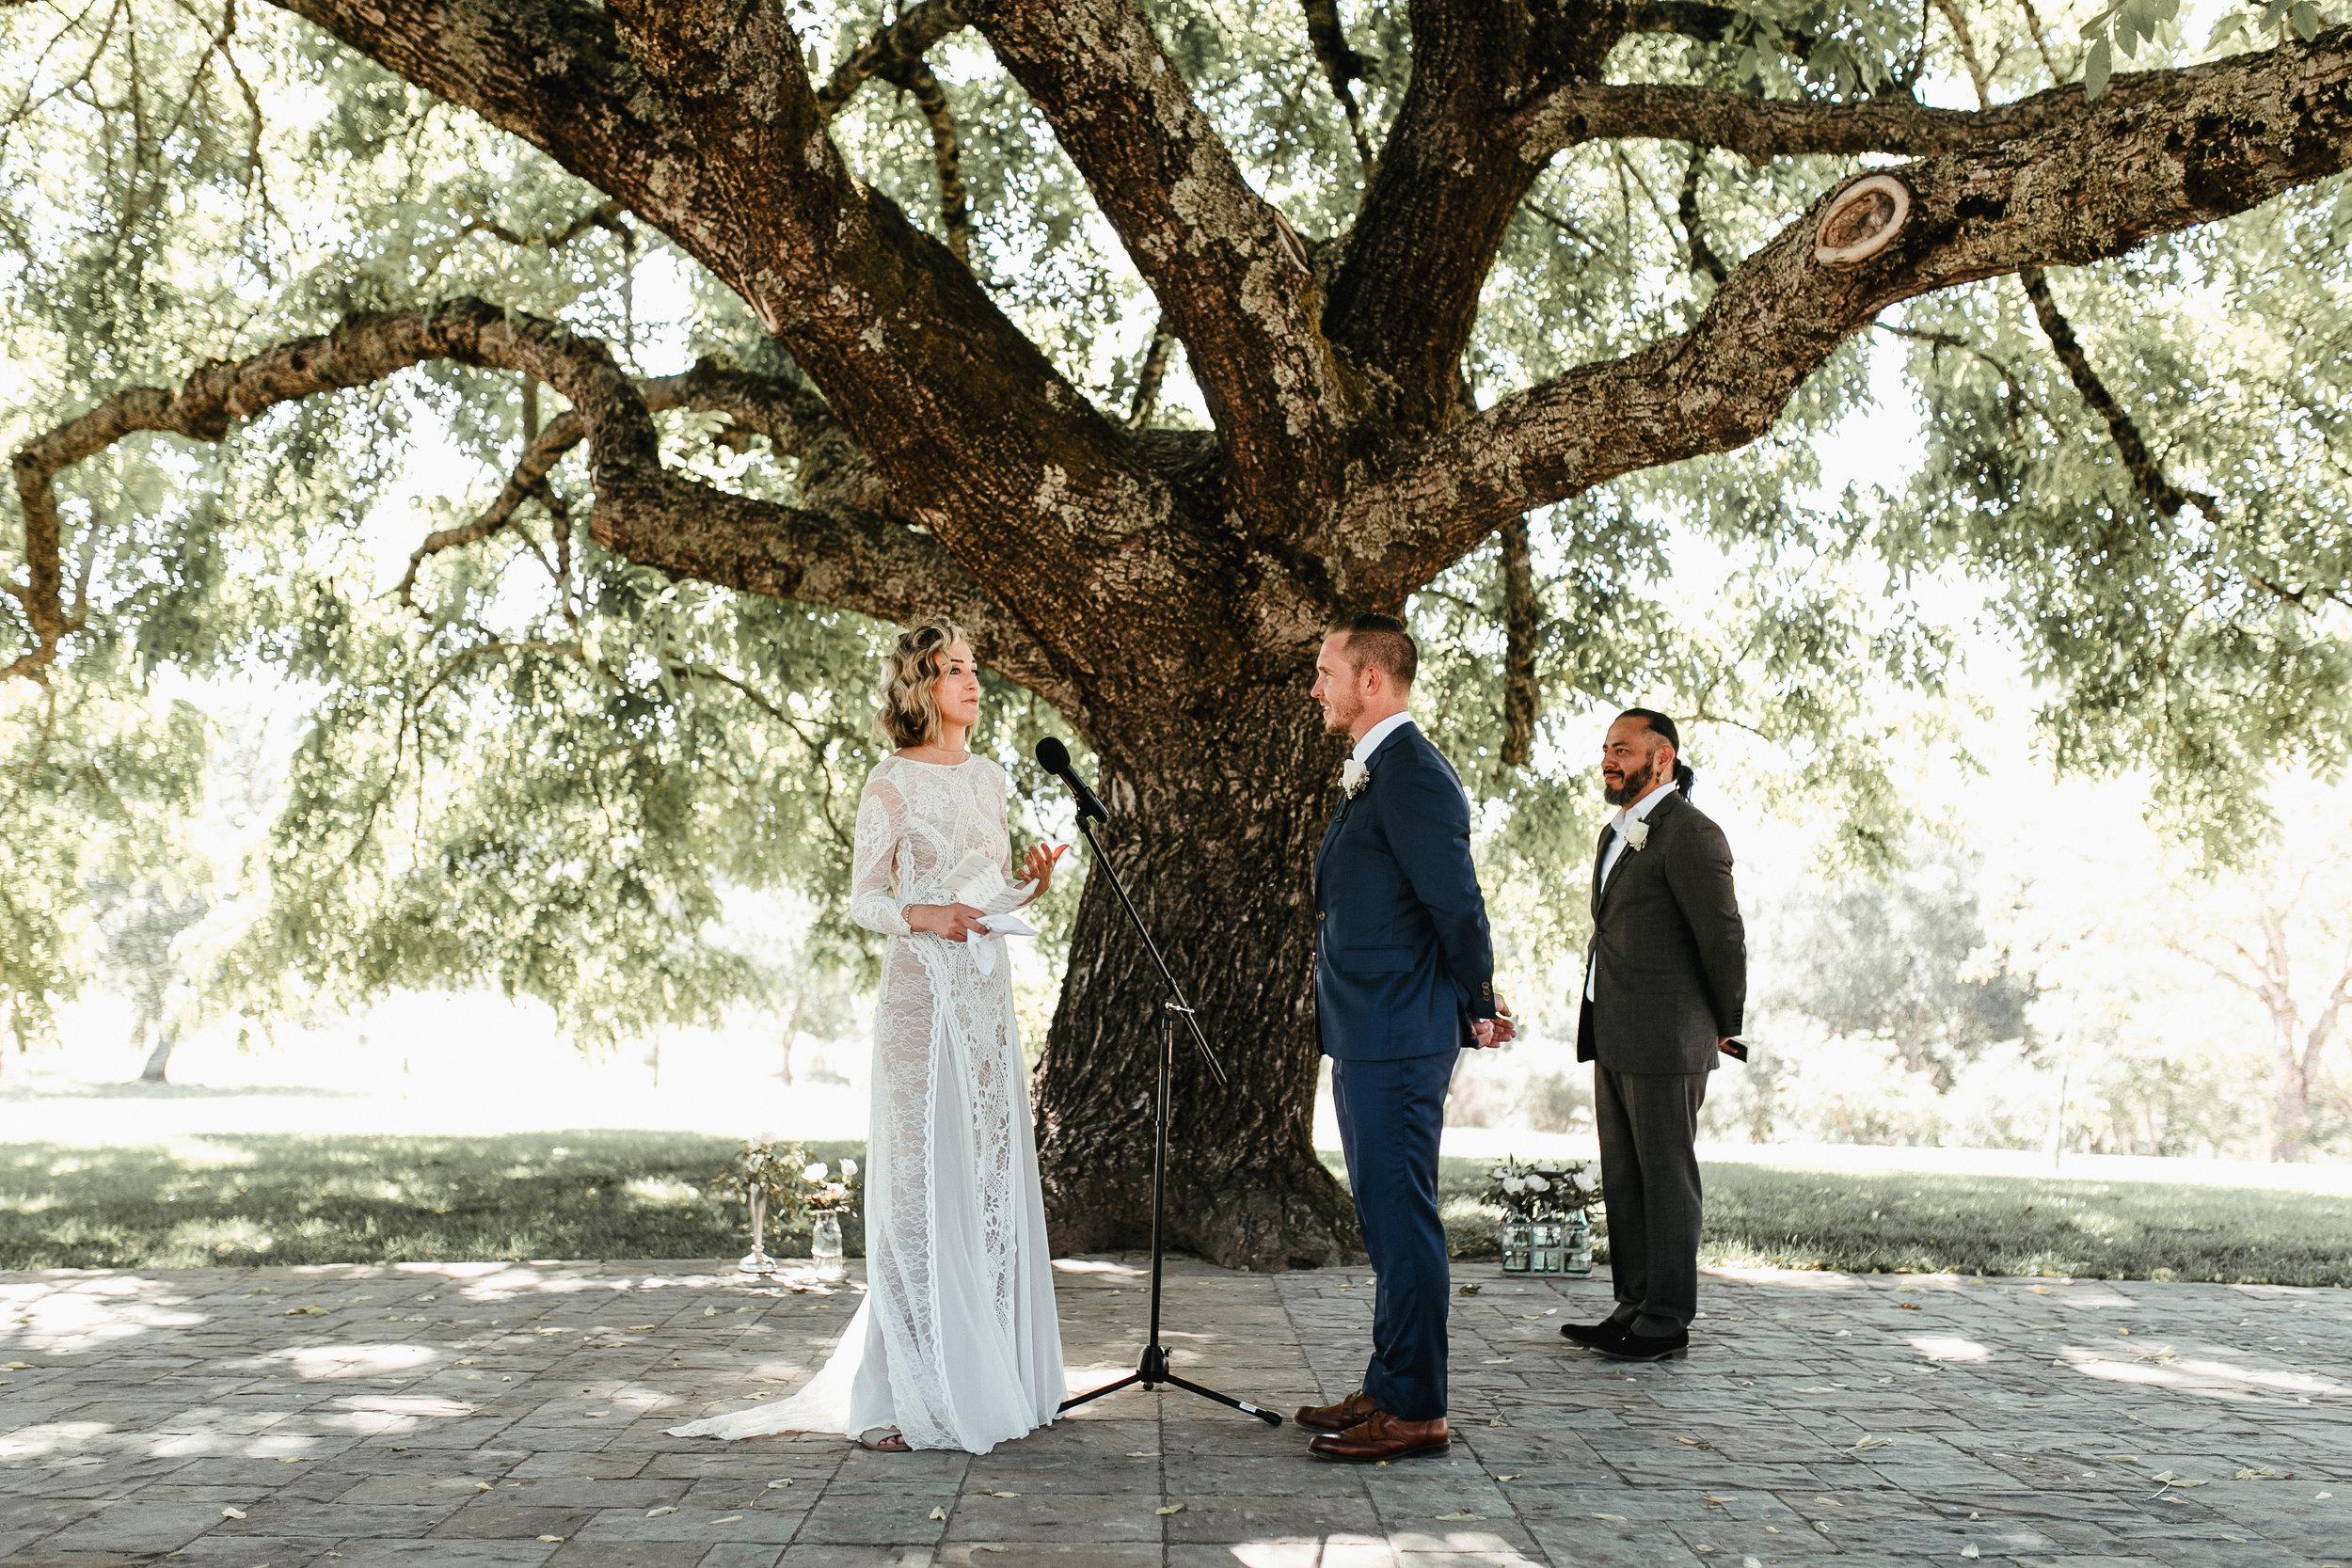 180527_JKM_Paula_Brian_Wedding_Final-10148.jpg